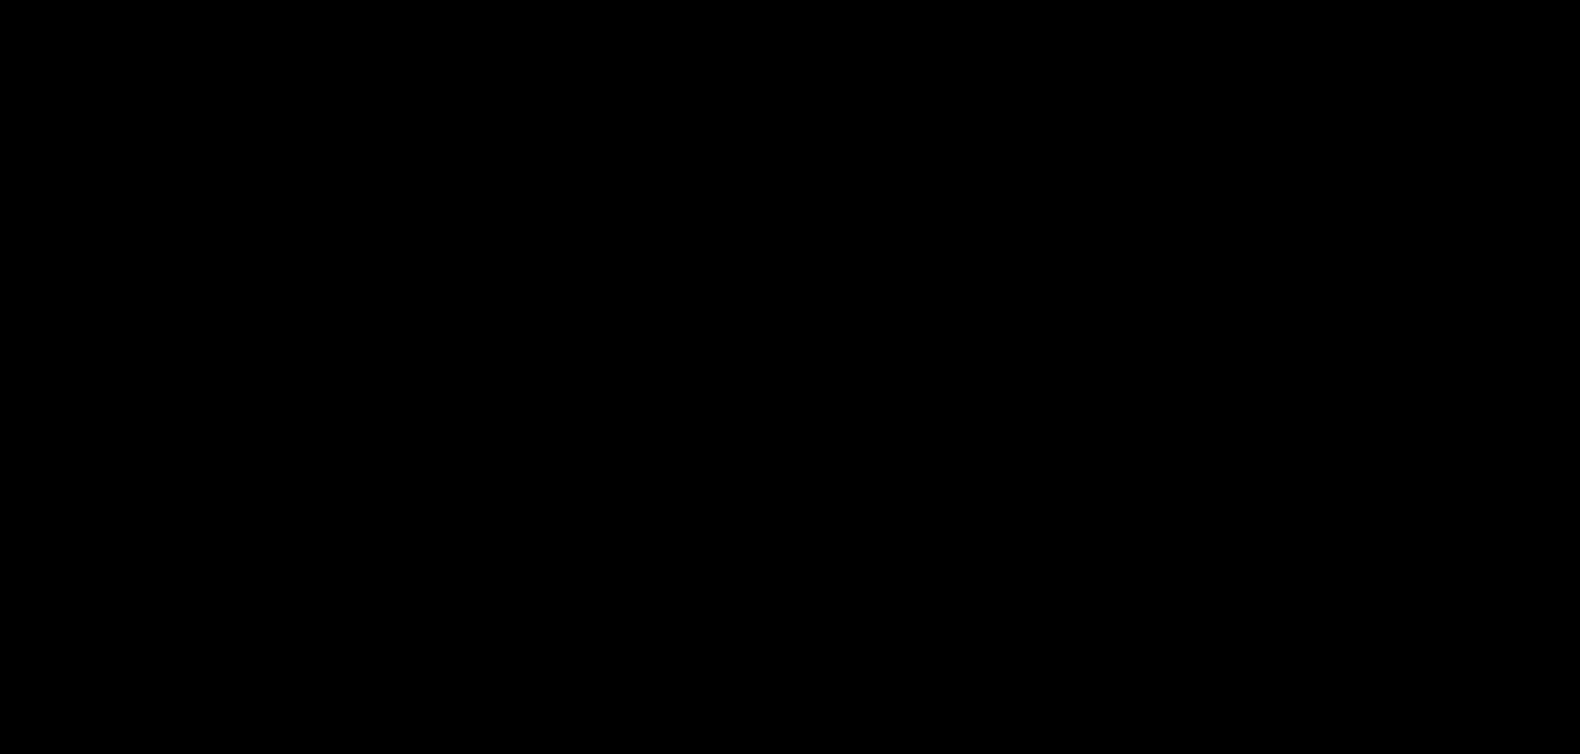 kariluoma